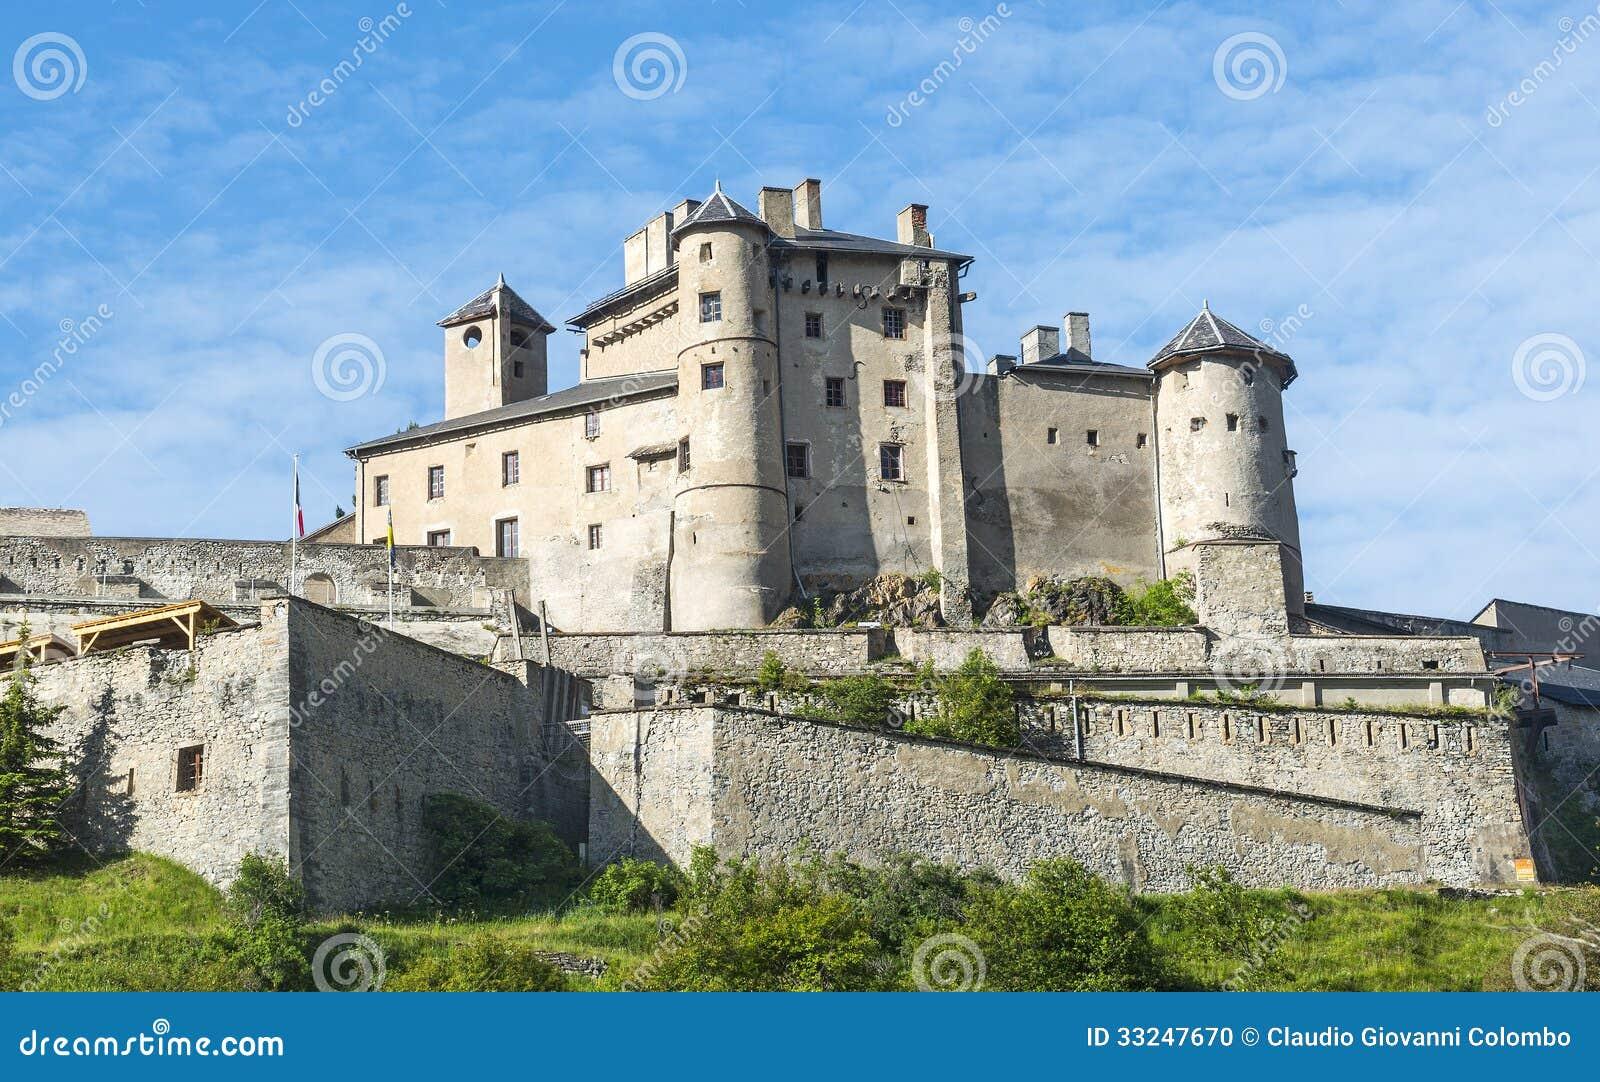 chateau queyras stock photo image 33247670. Black Bedroom Furniture Sets. Home Design Ideas